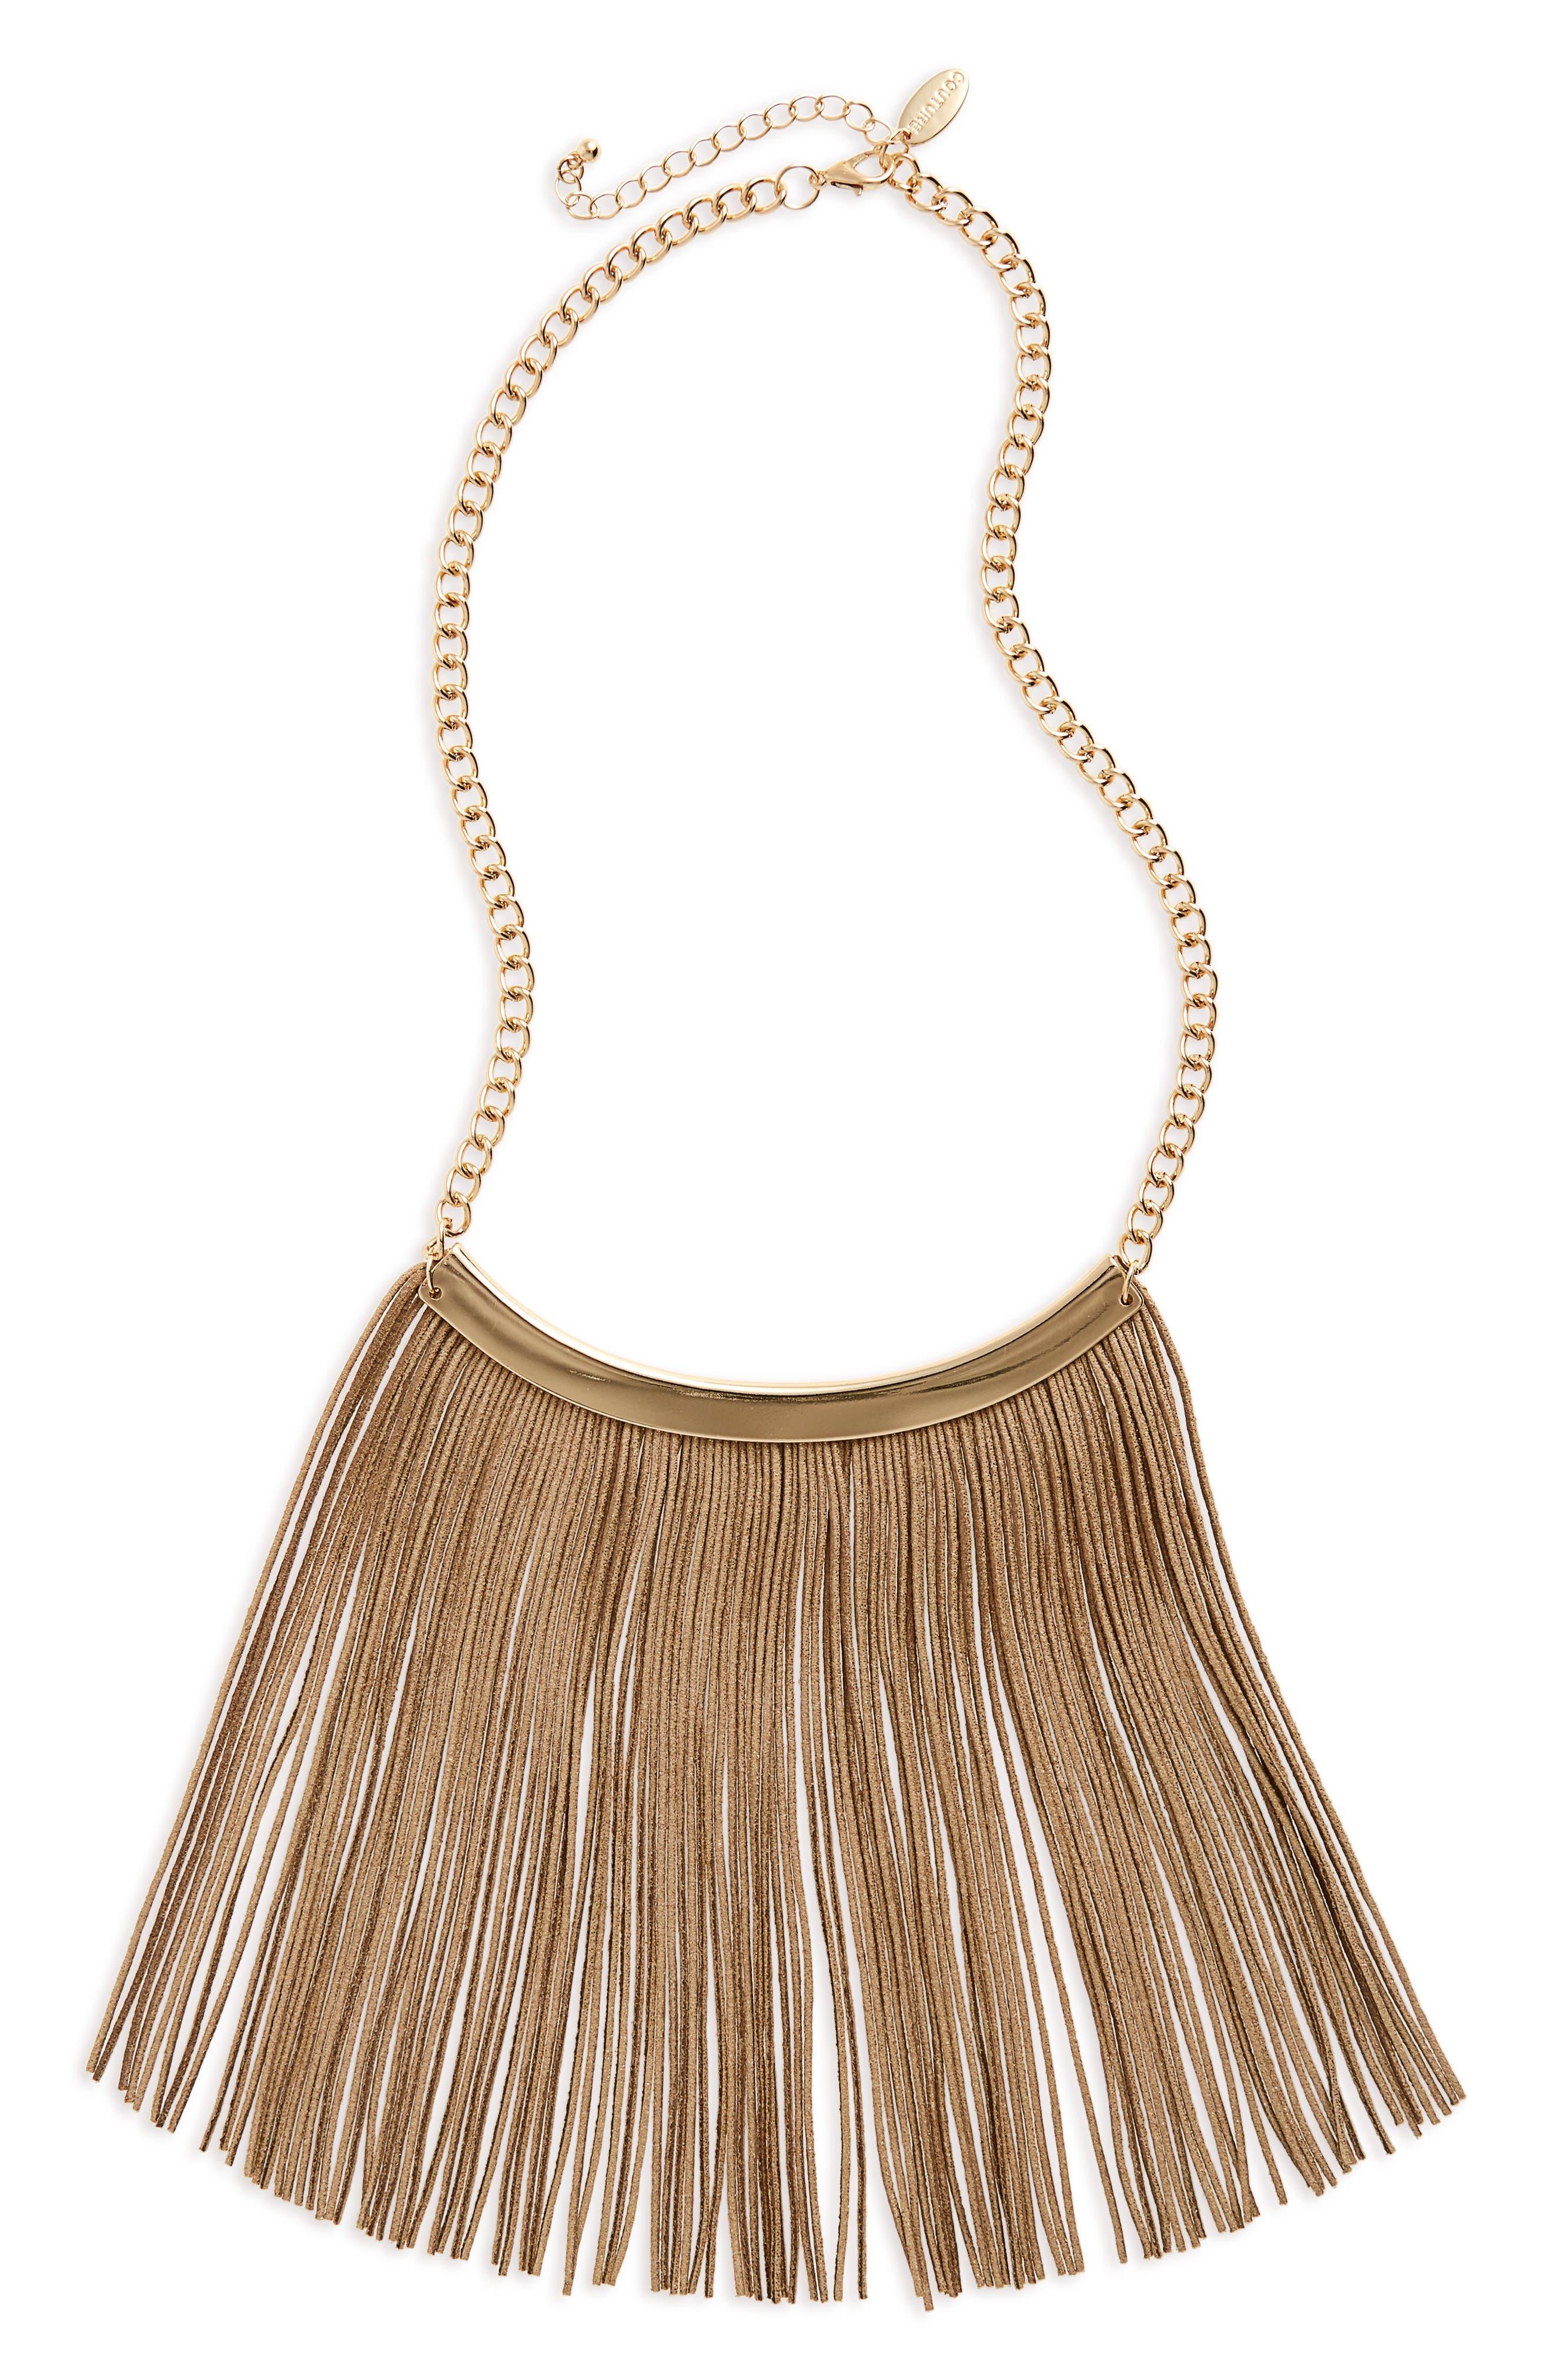 Couture Liquid Fringe Bib Necklace,                         Main,                         color, Gold